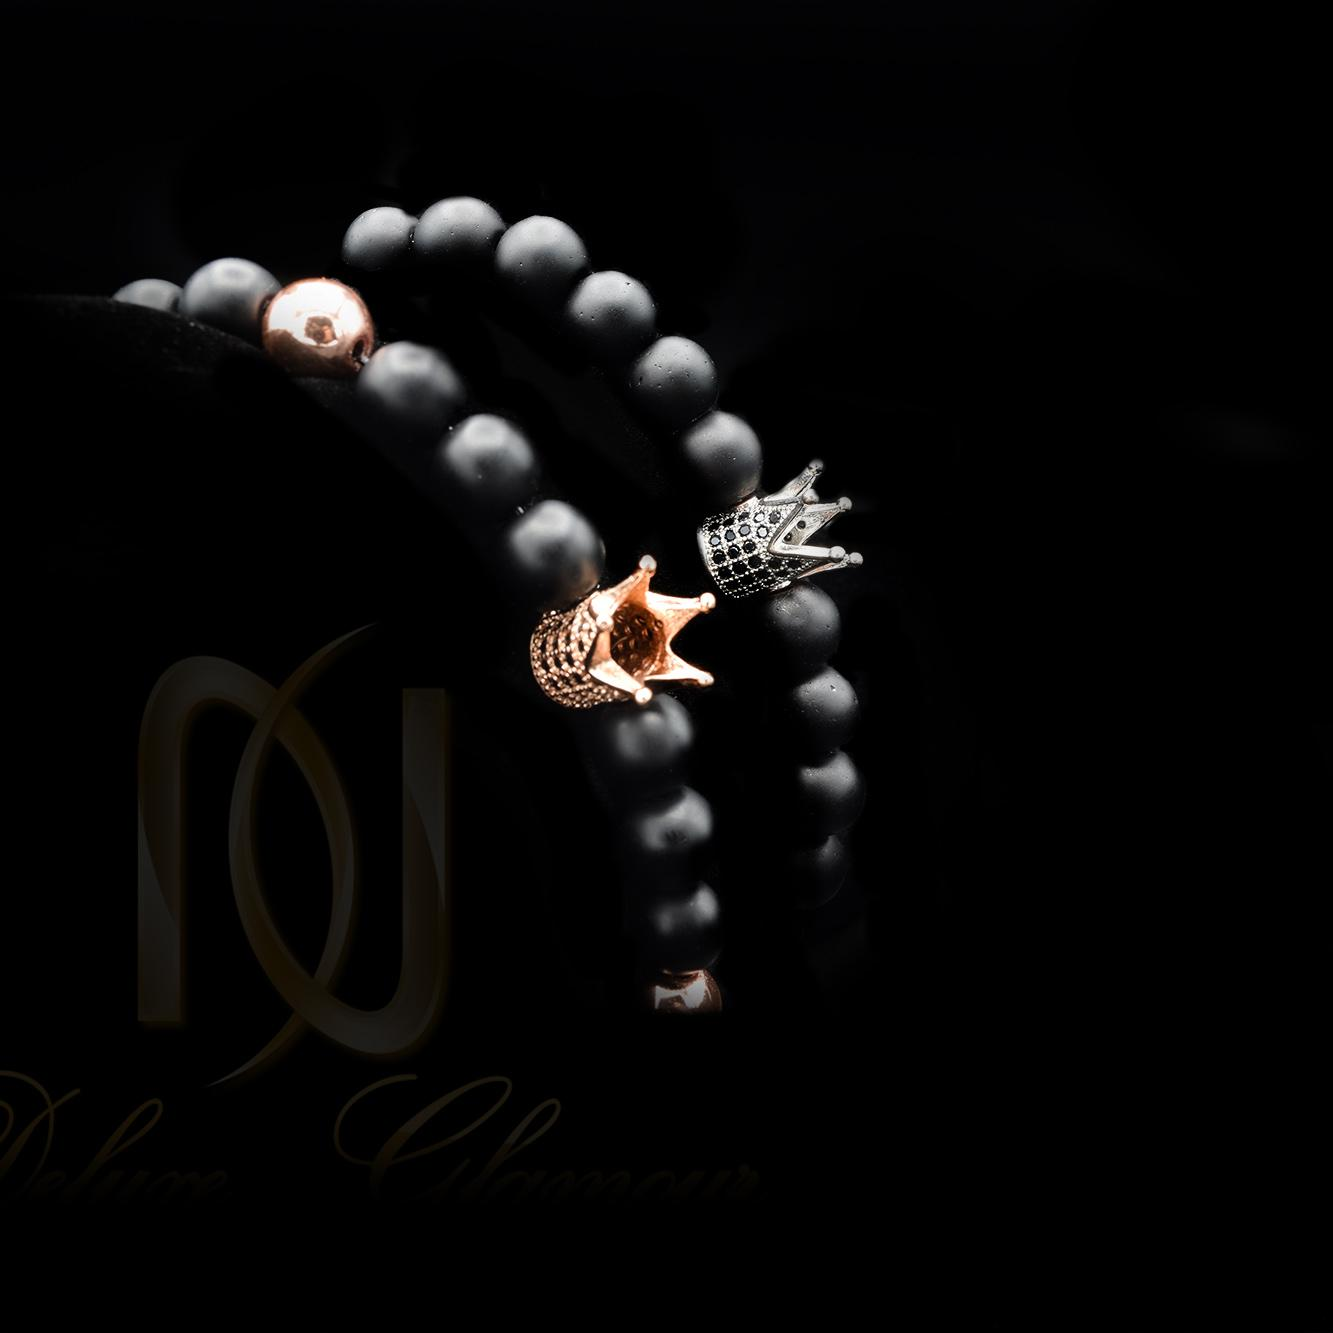 دستبند ست اسپرت عاشقانه sr-n111 (4)